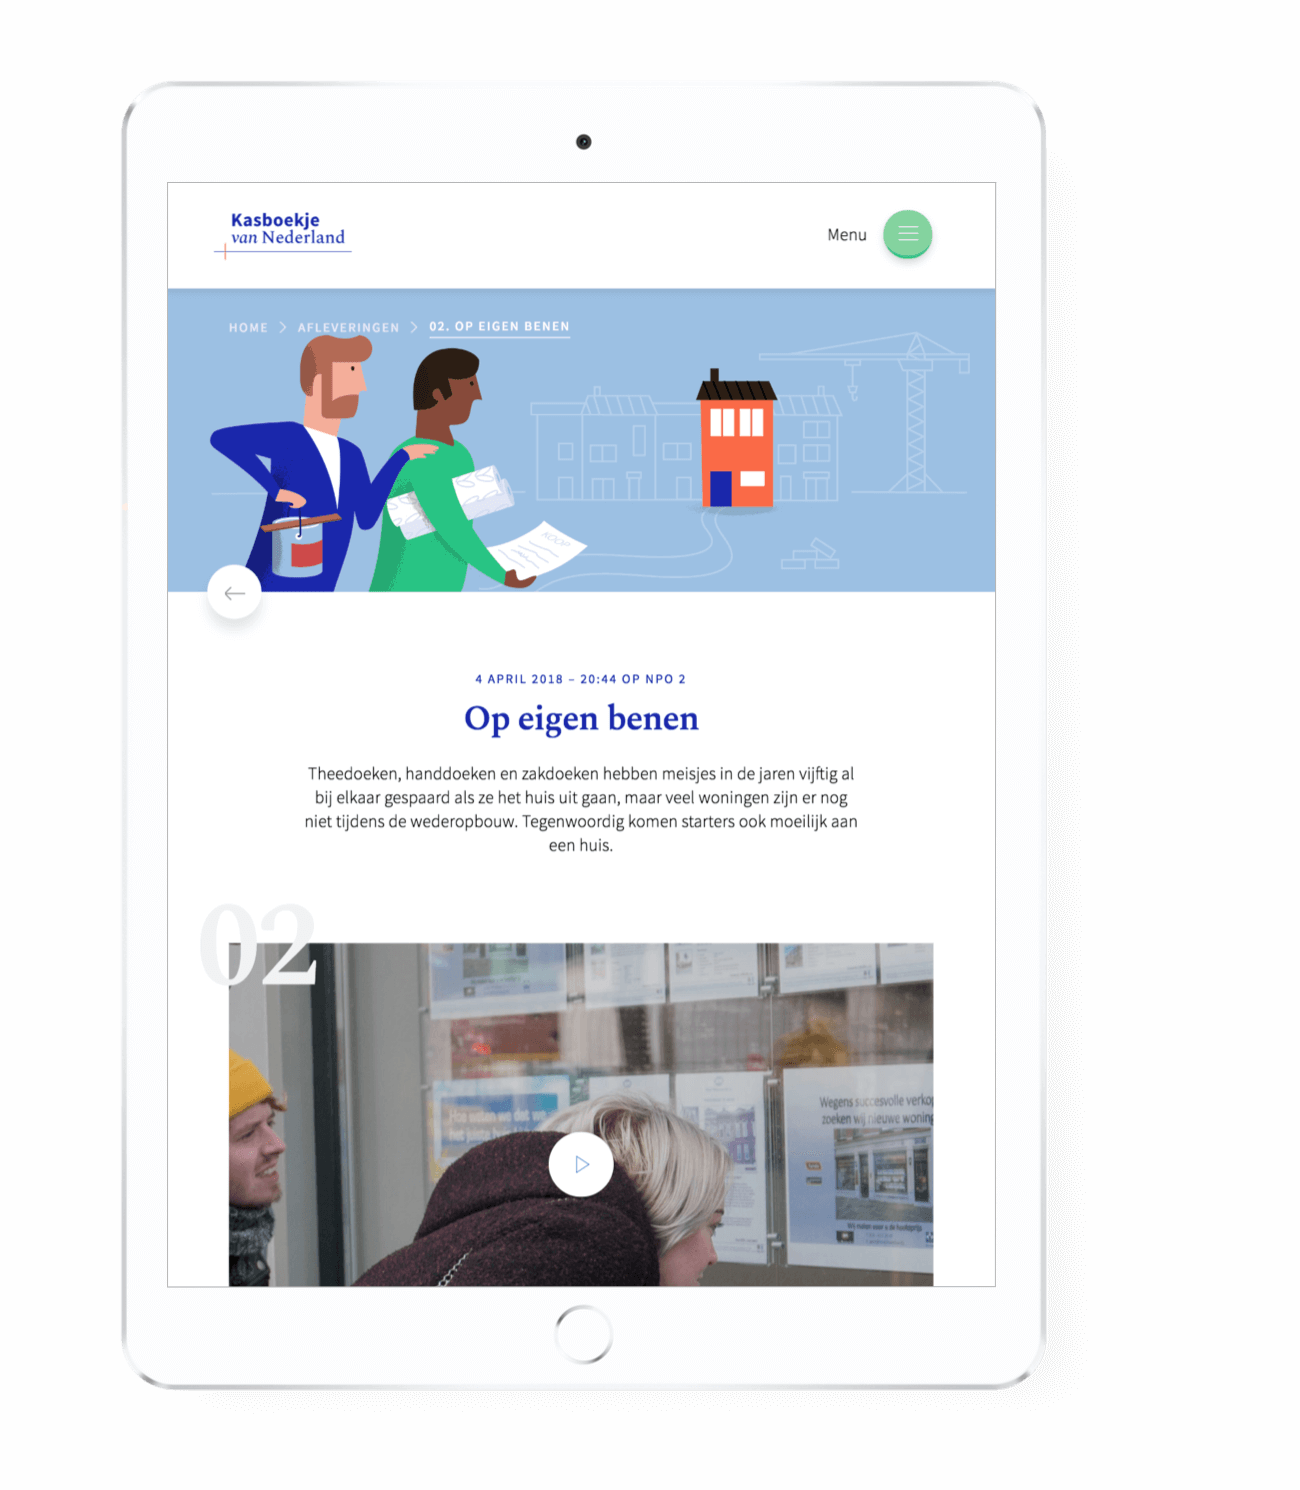 Kasboekje van Nederland episodes playback page on an iPad tablet